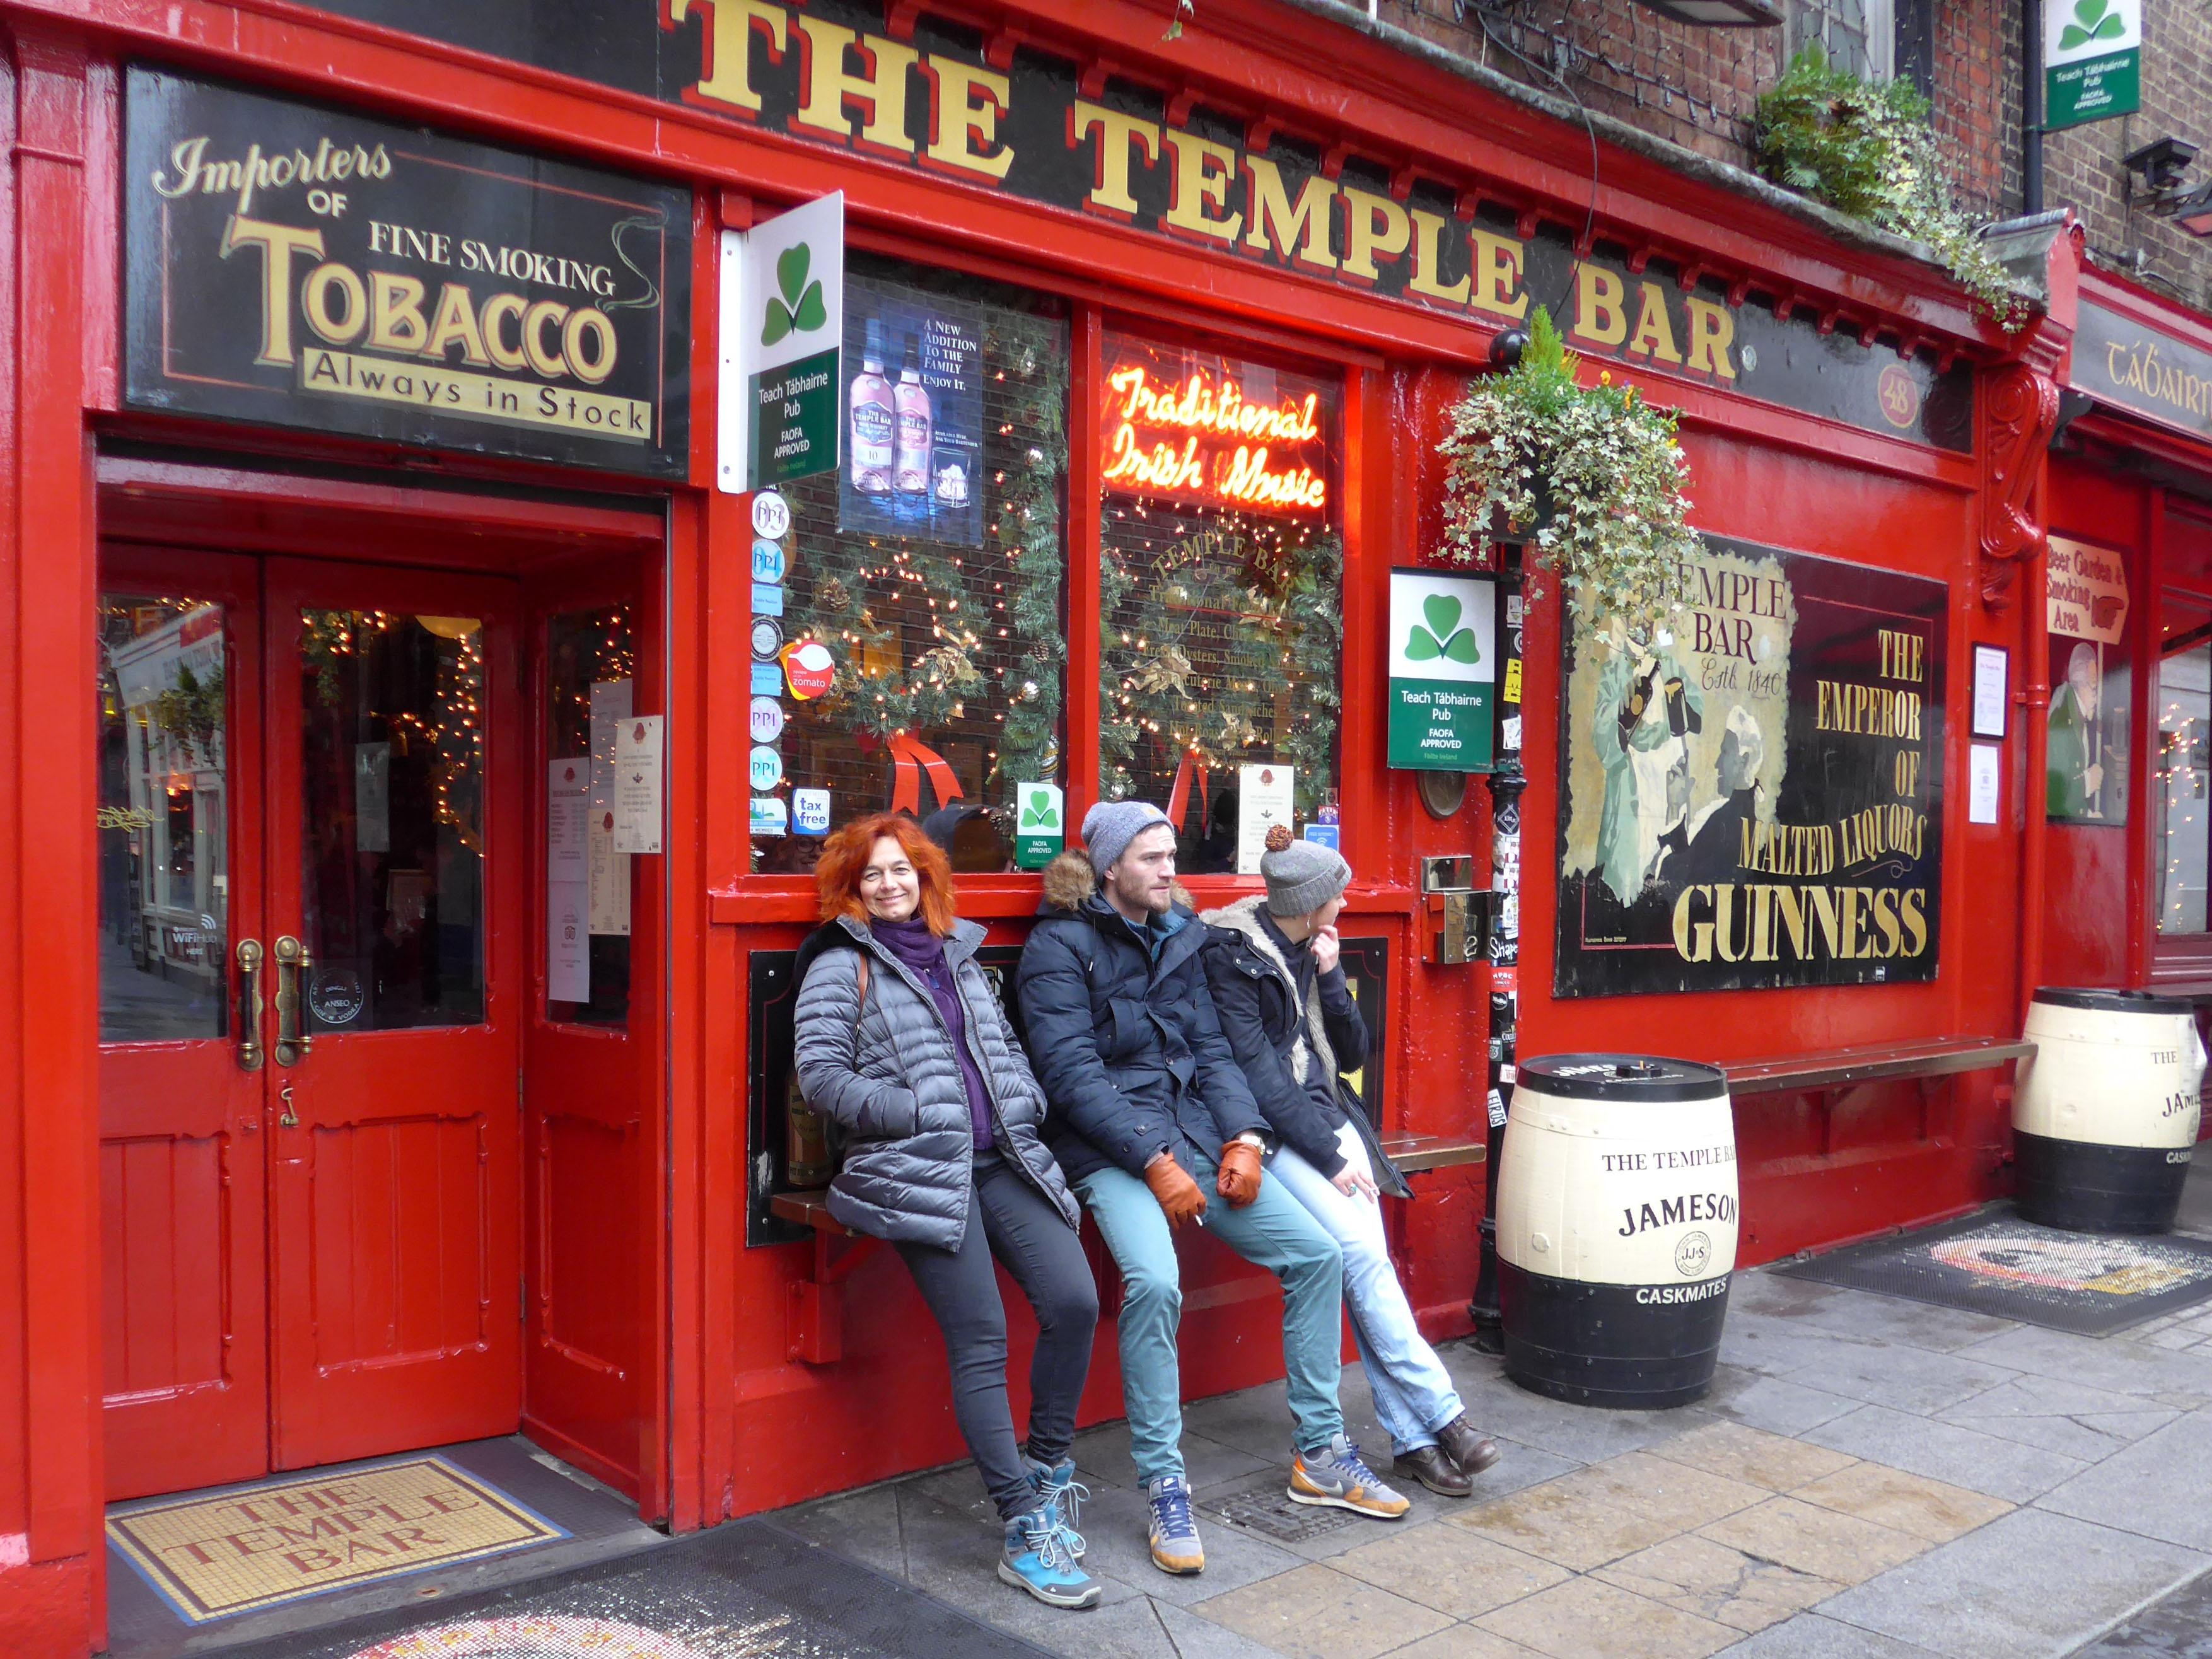 19 Irlanda- Temple Bar Dublino